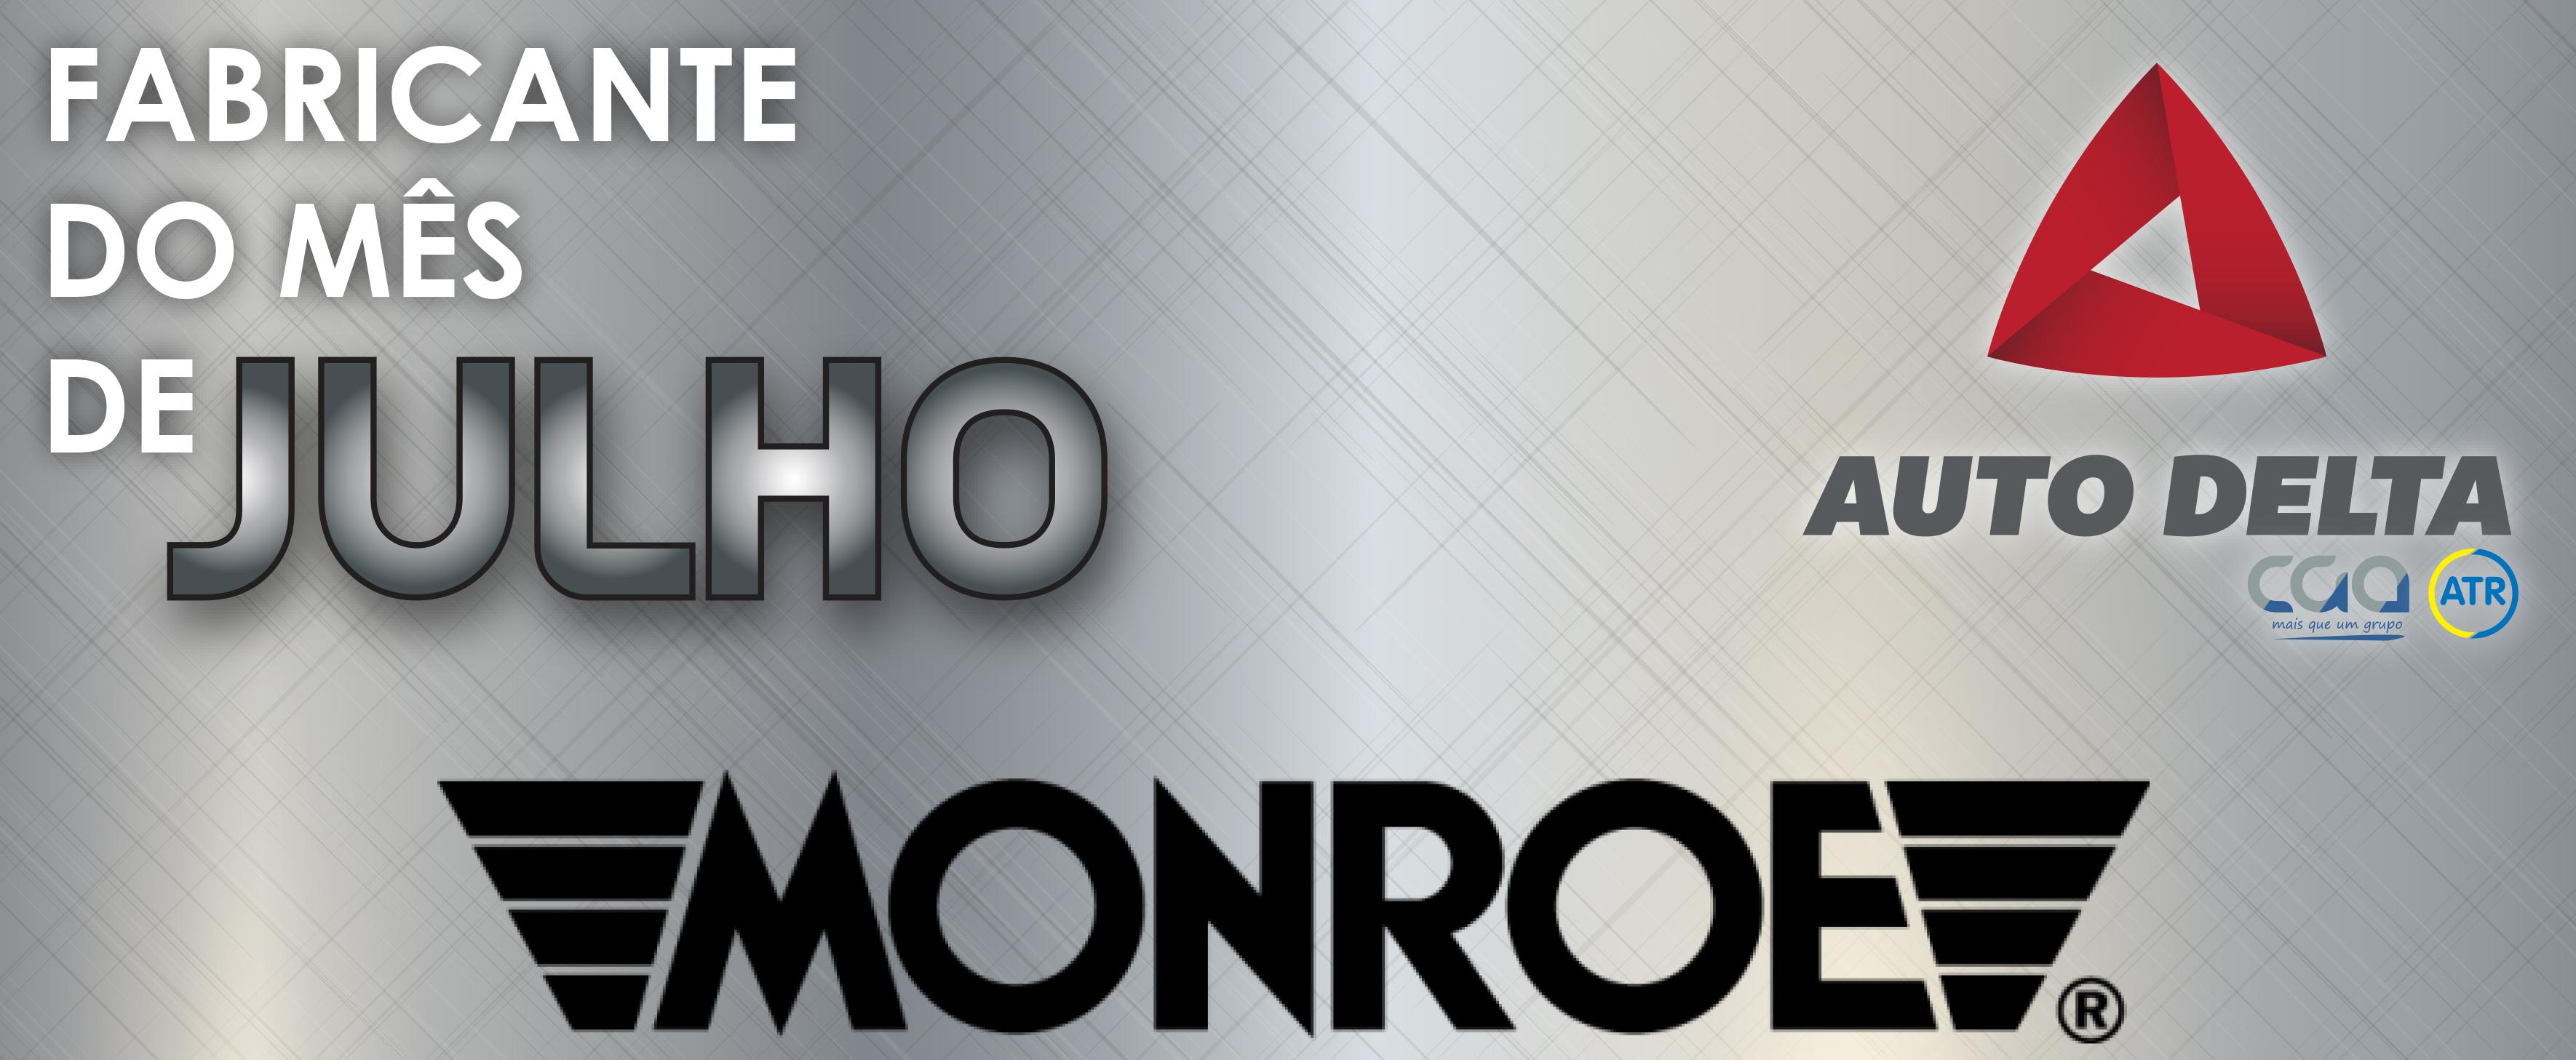 A Monroe já é Fabricante do Mês na Auto Delta